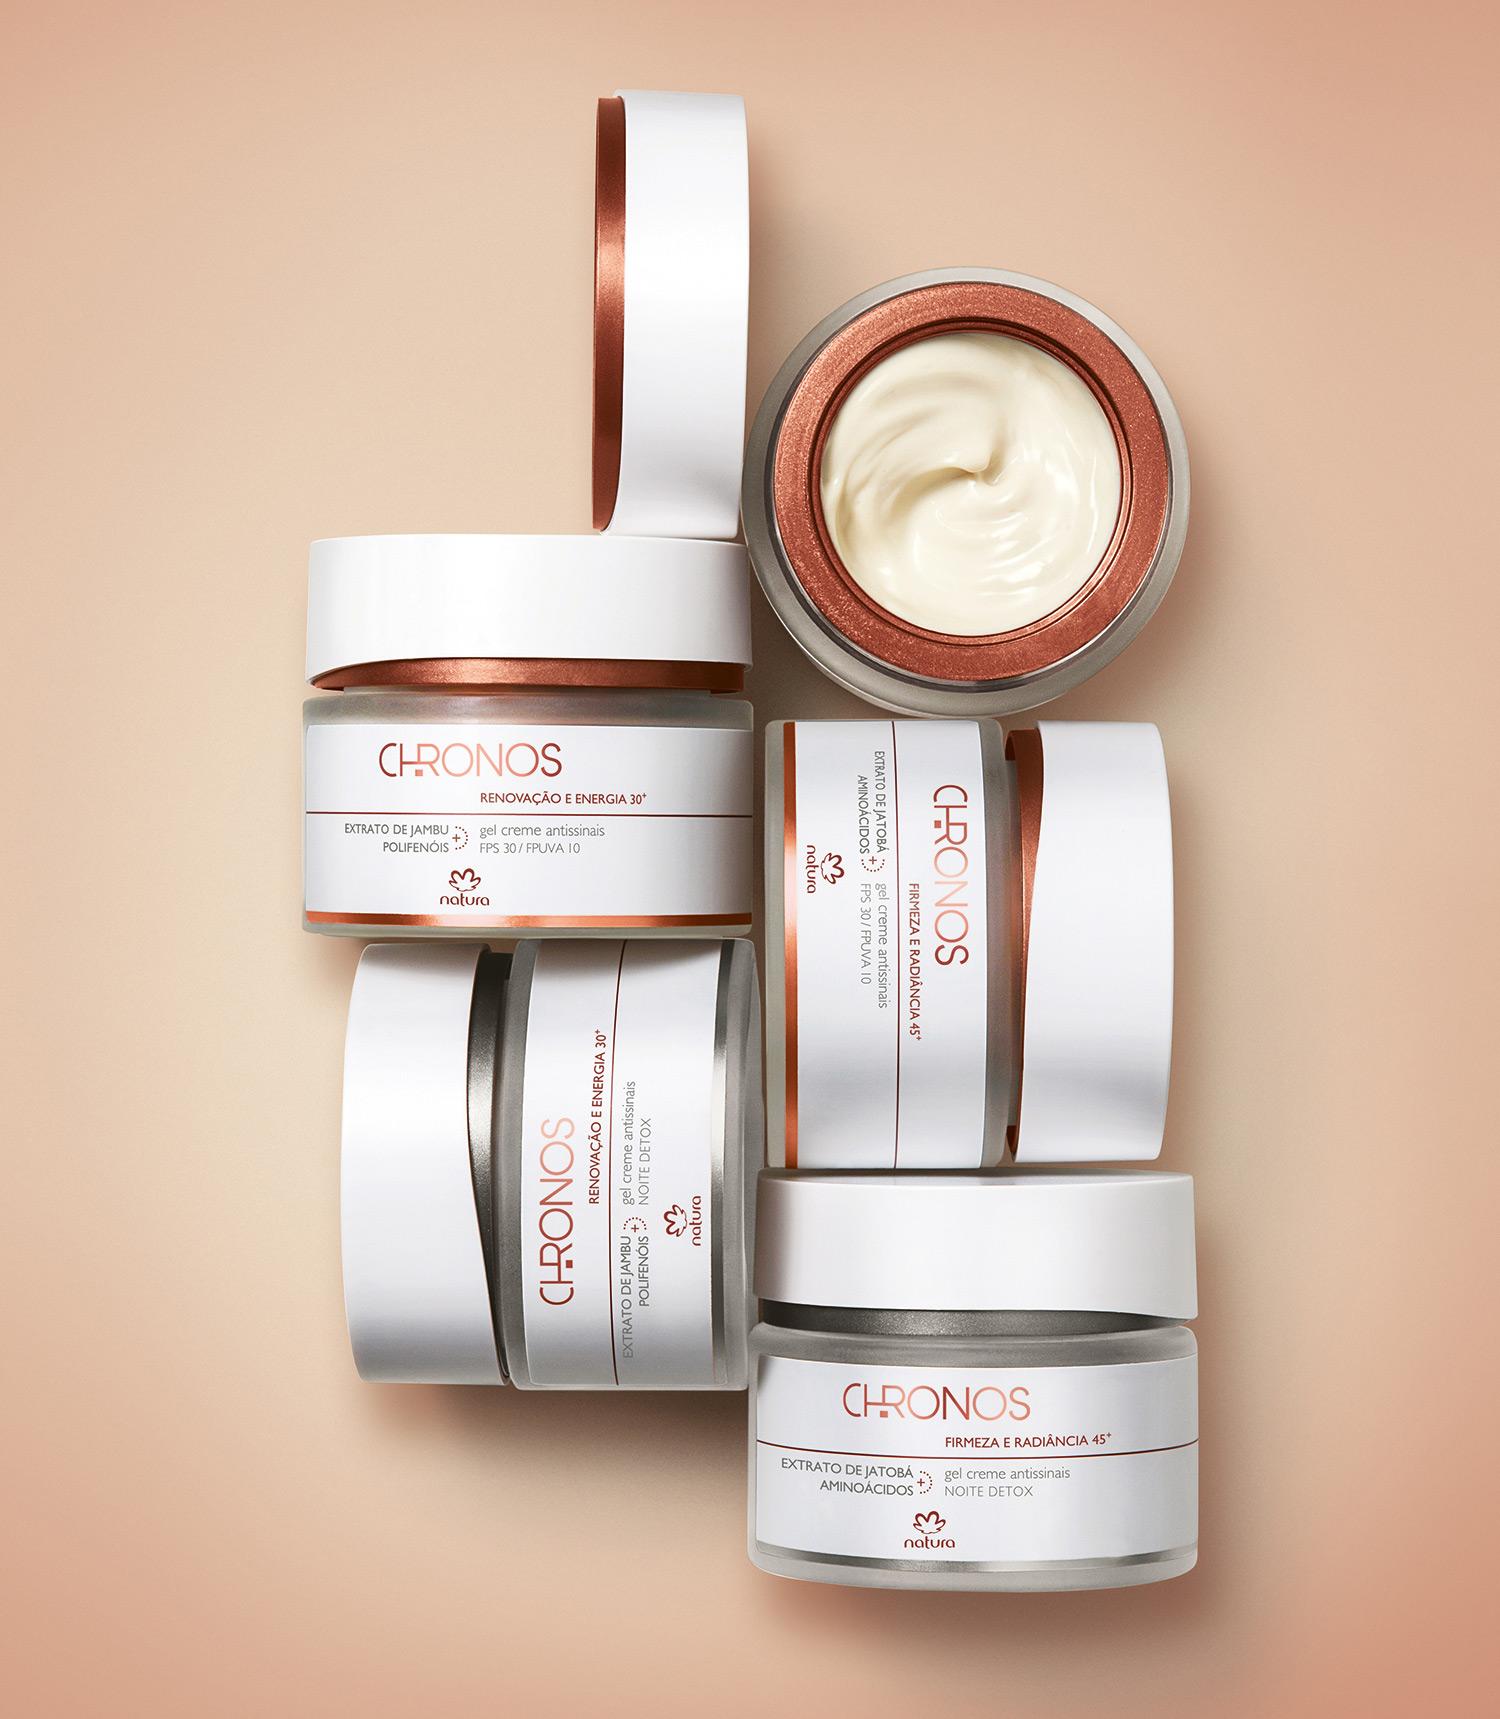 chelles-e-hayashi-design-portfolio-natura-chronos-ageing-reversing-structural-product-packaging-copper-hotstamp-reversing